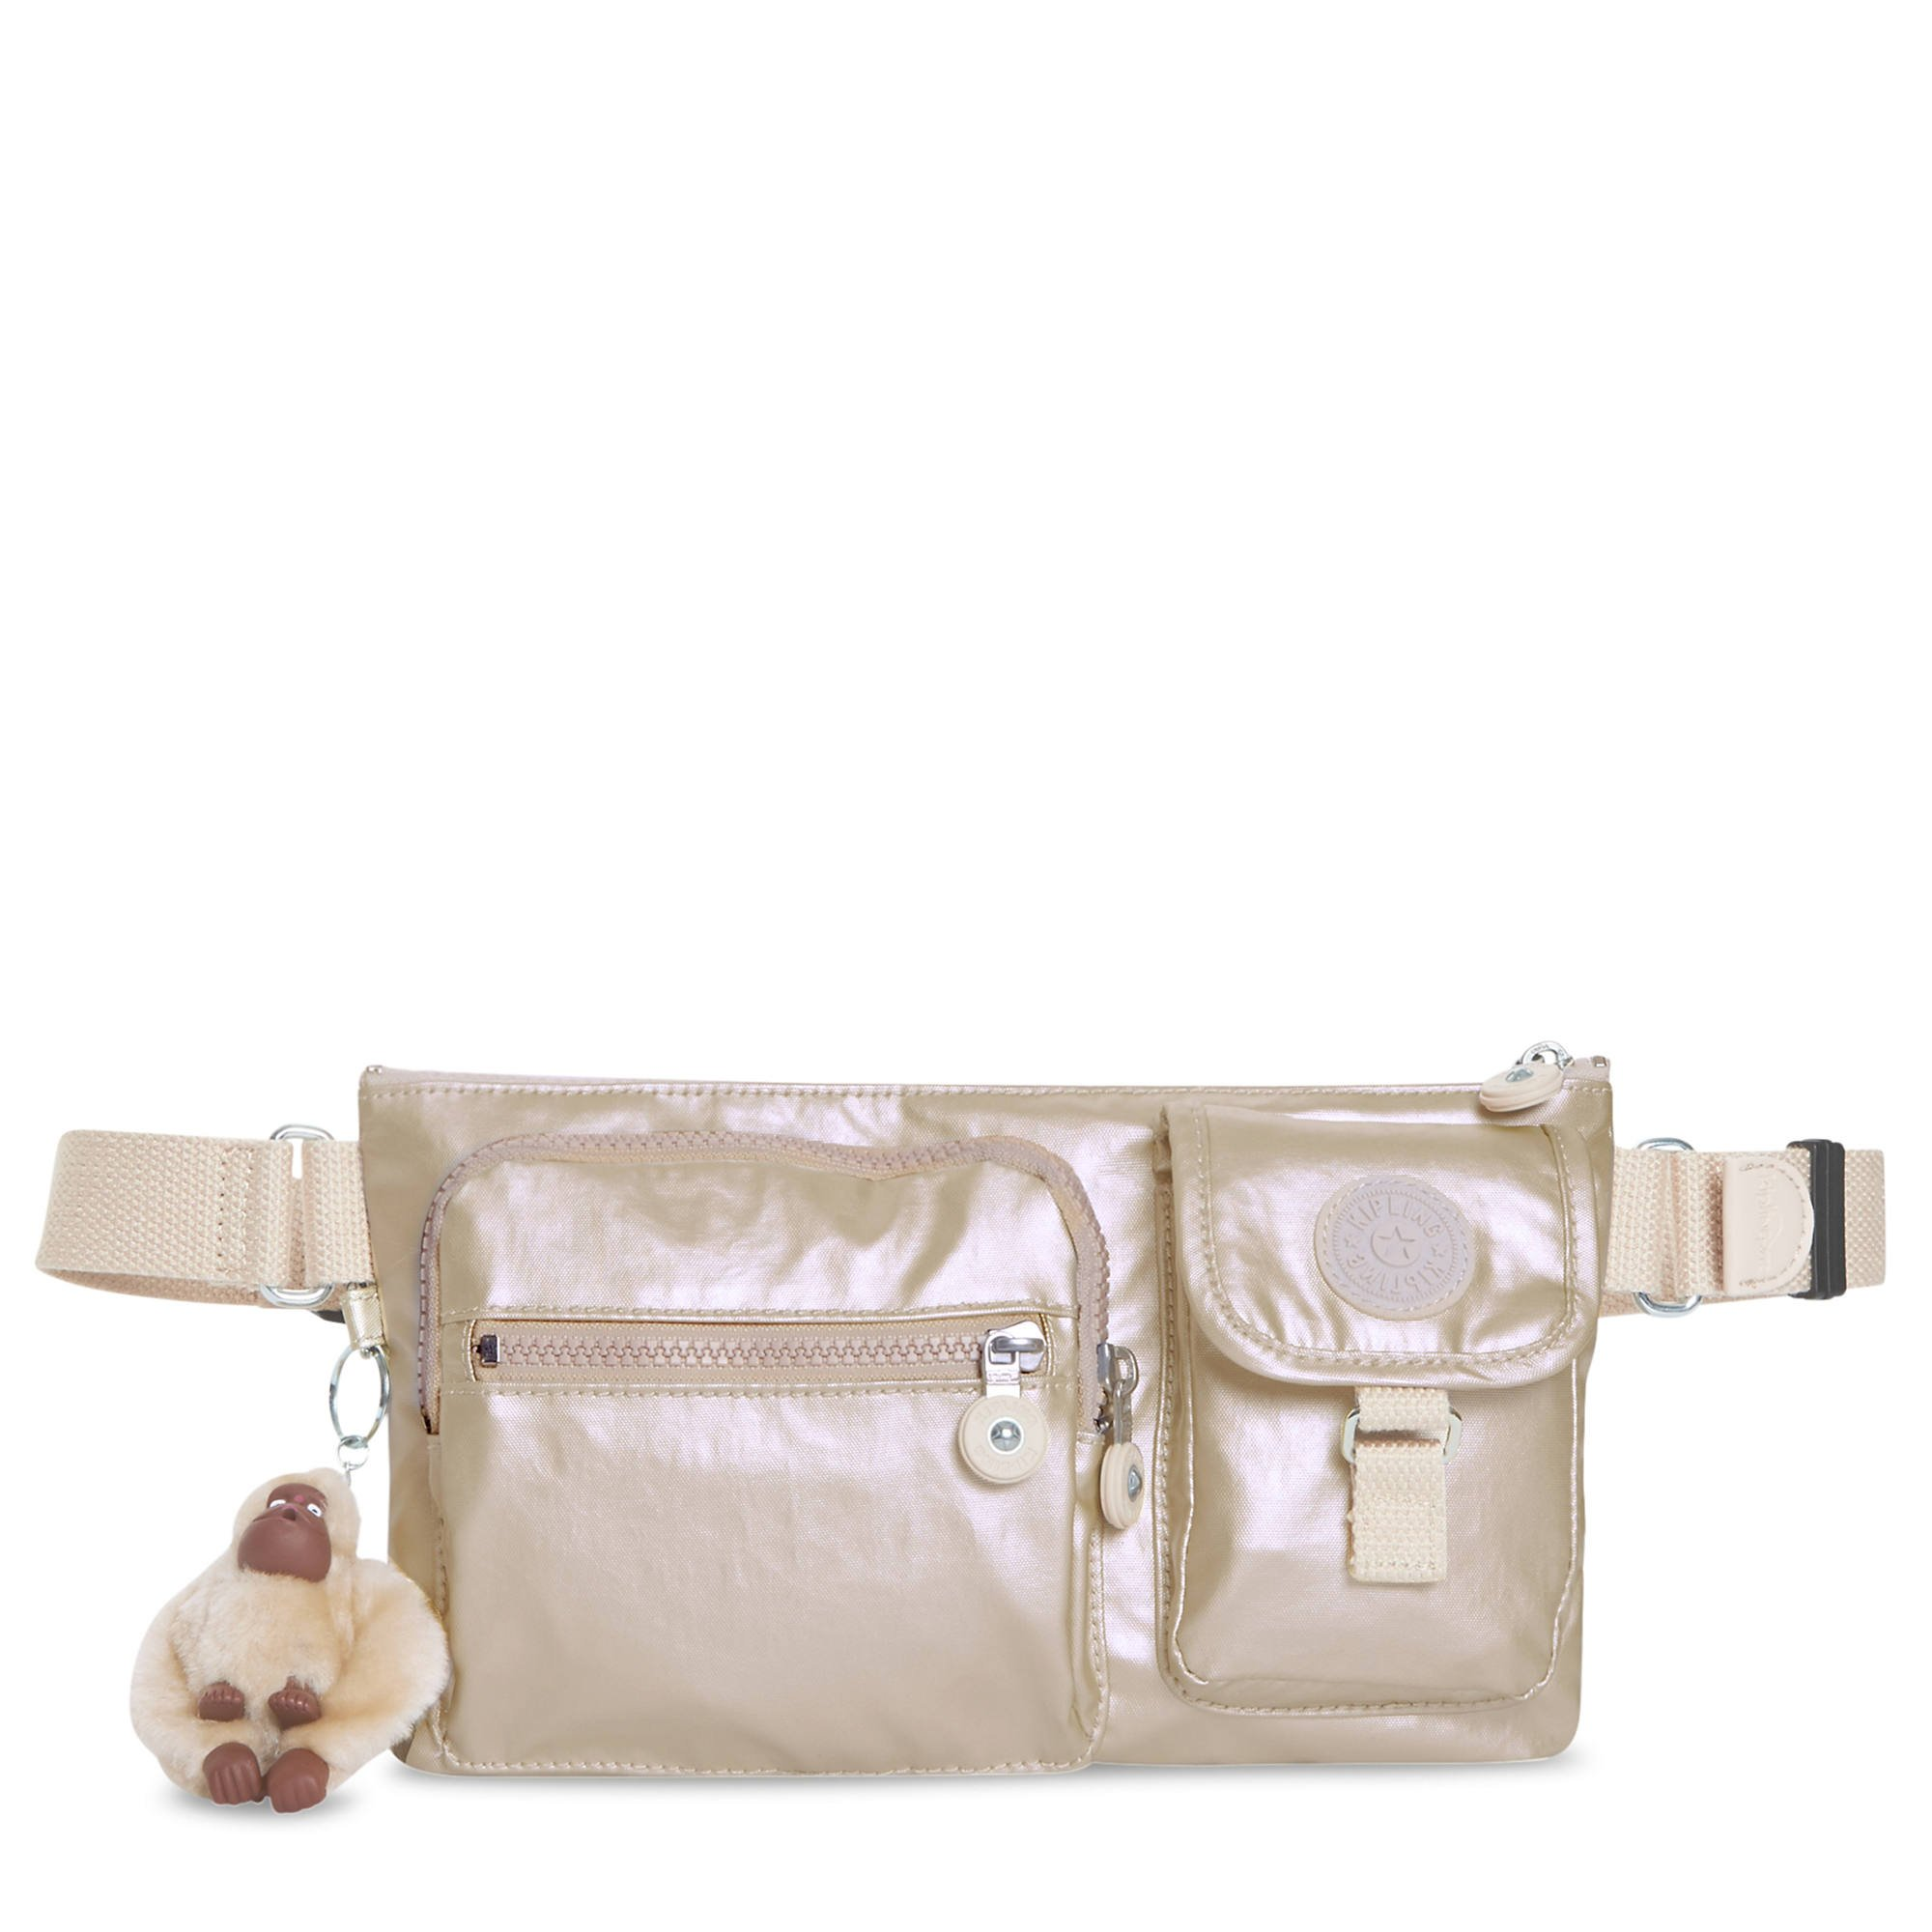 Kipling Presto Sparkly Gold Convertible Crossbody Bag, Sparklygld